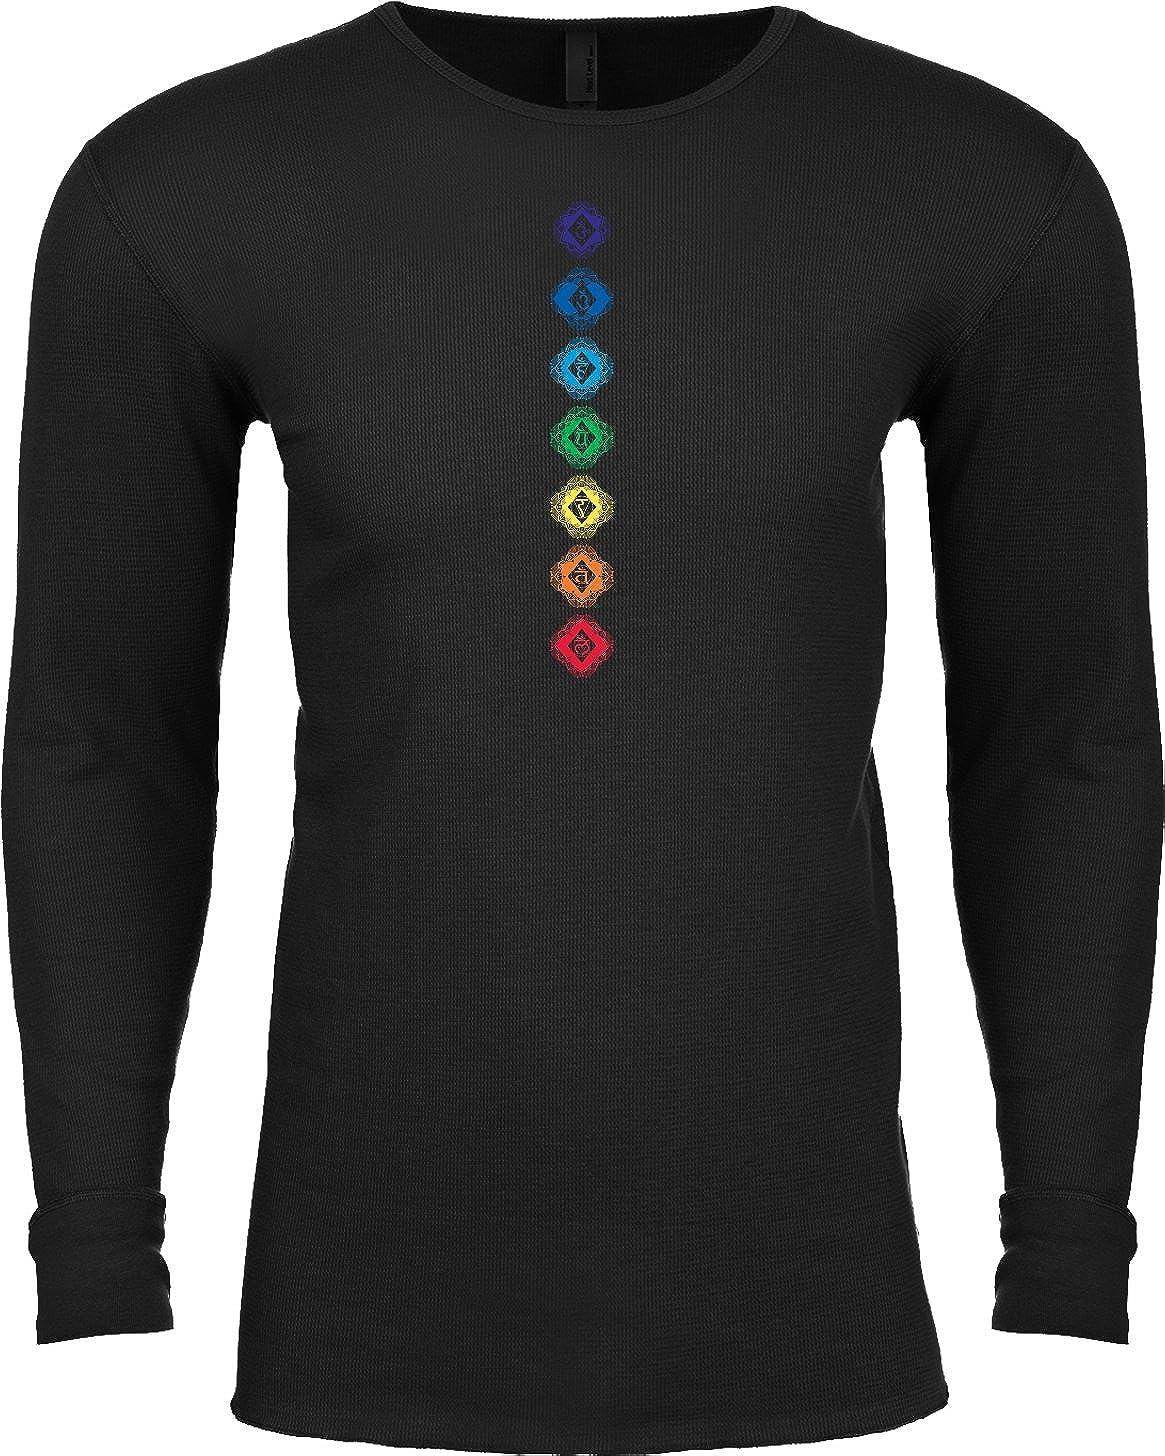 Buy Cool Shirts Mens Yoga Tee Diamond Chakras Thermal Shirt